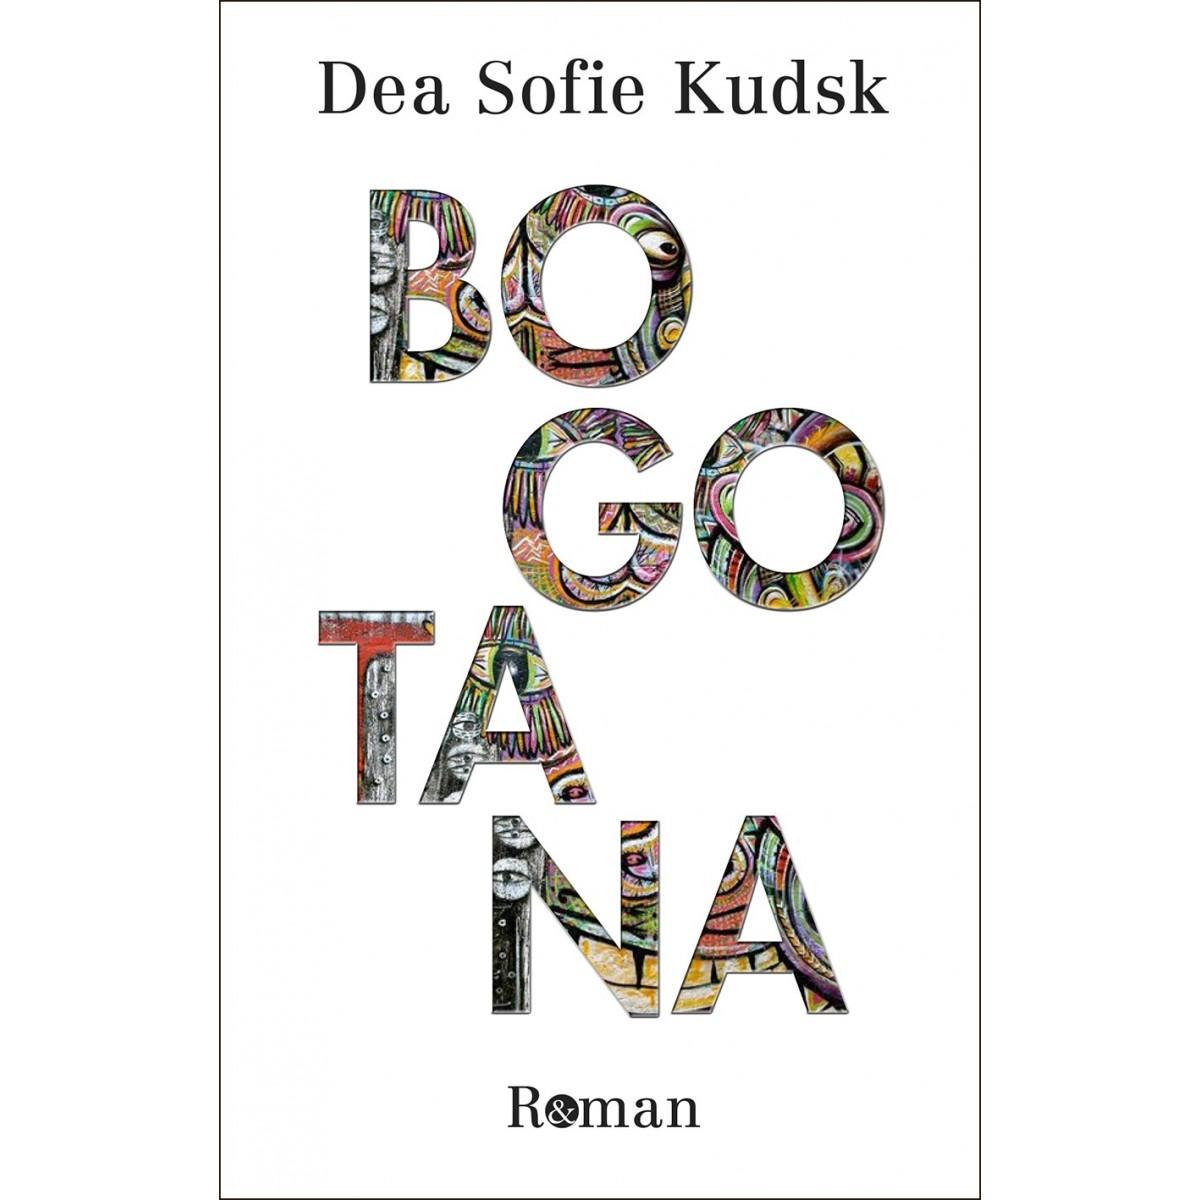 Dea Sofie Kudsk: Bogotana